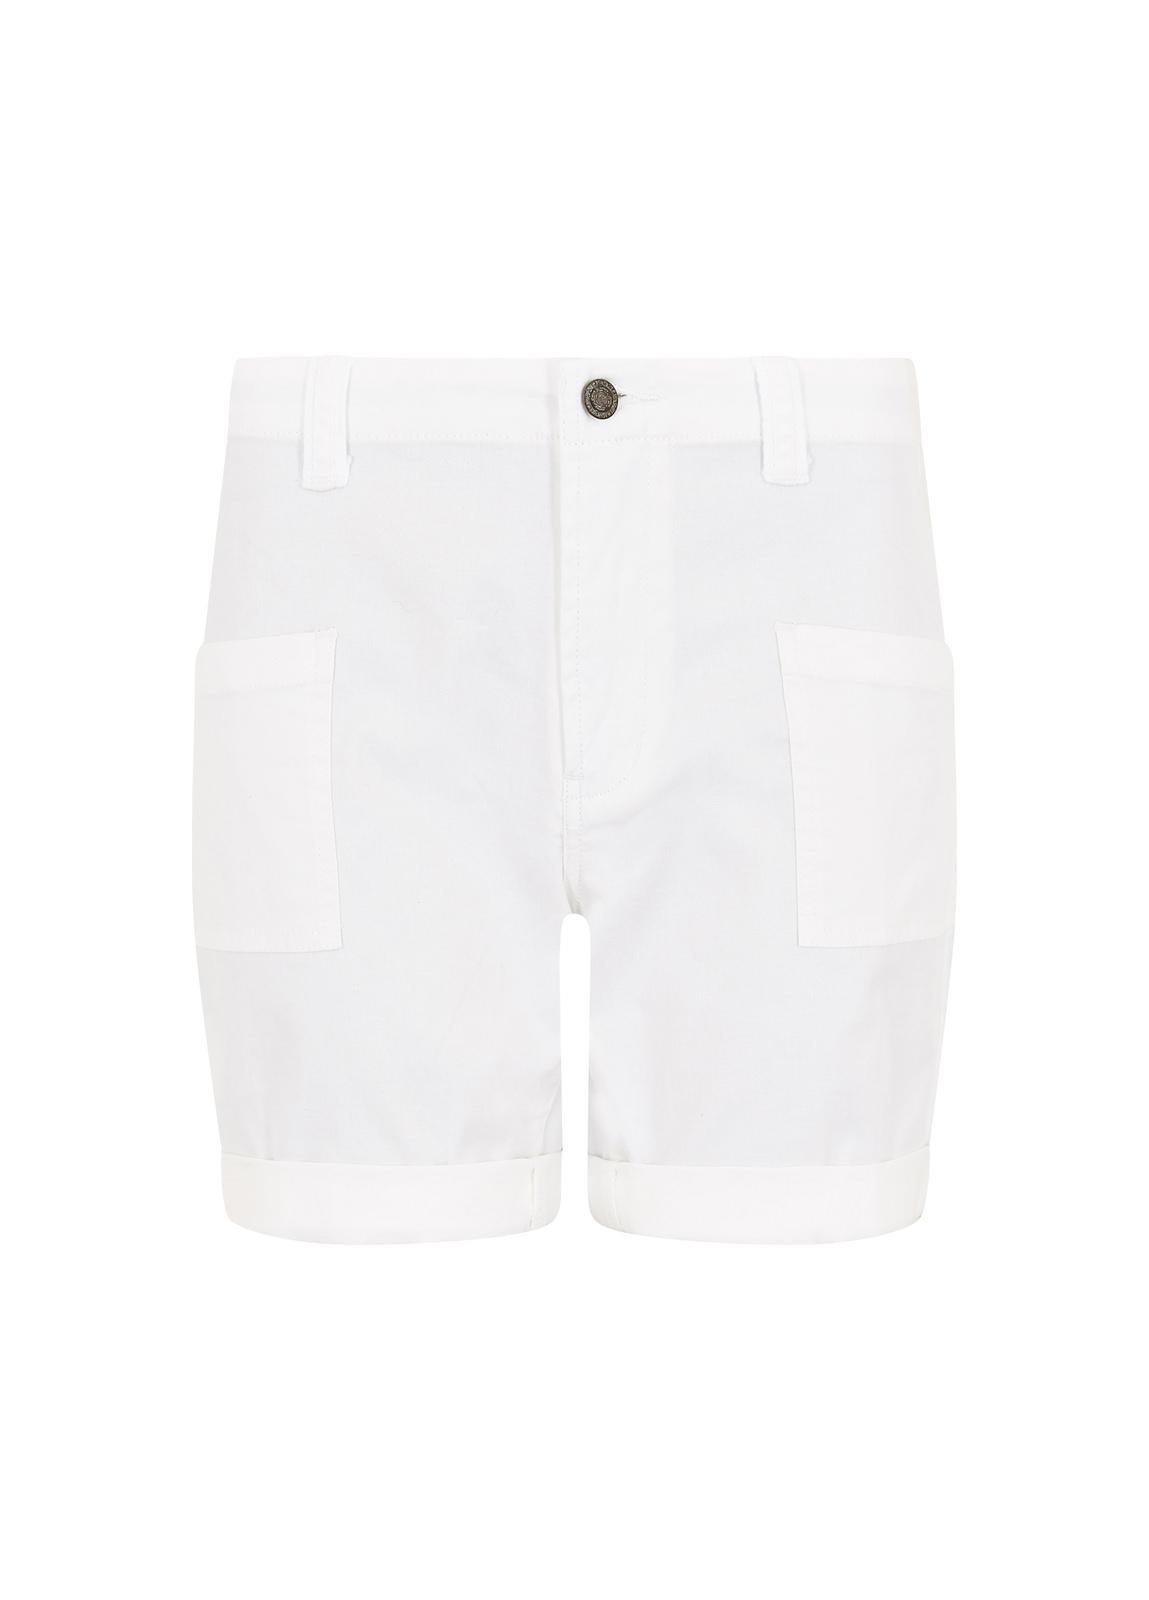 Bellinter Shorts - White